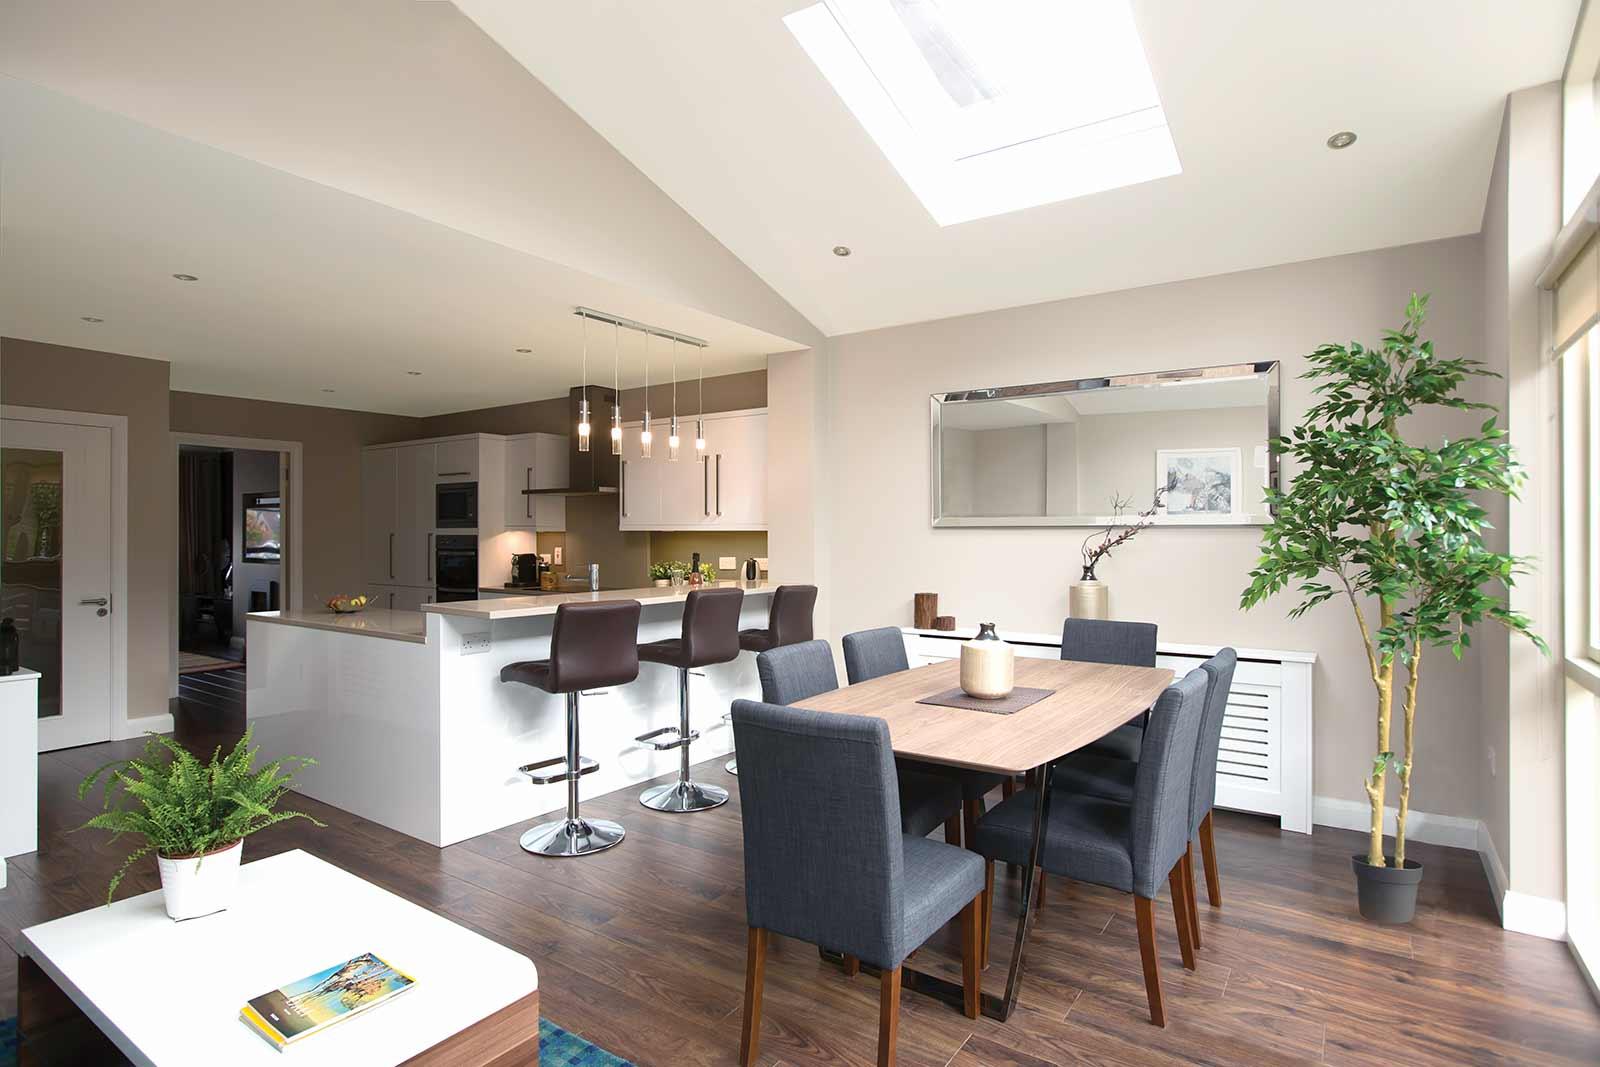 Carton-Interiors_P8_3_Open-plan-kitchen-living-room